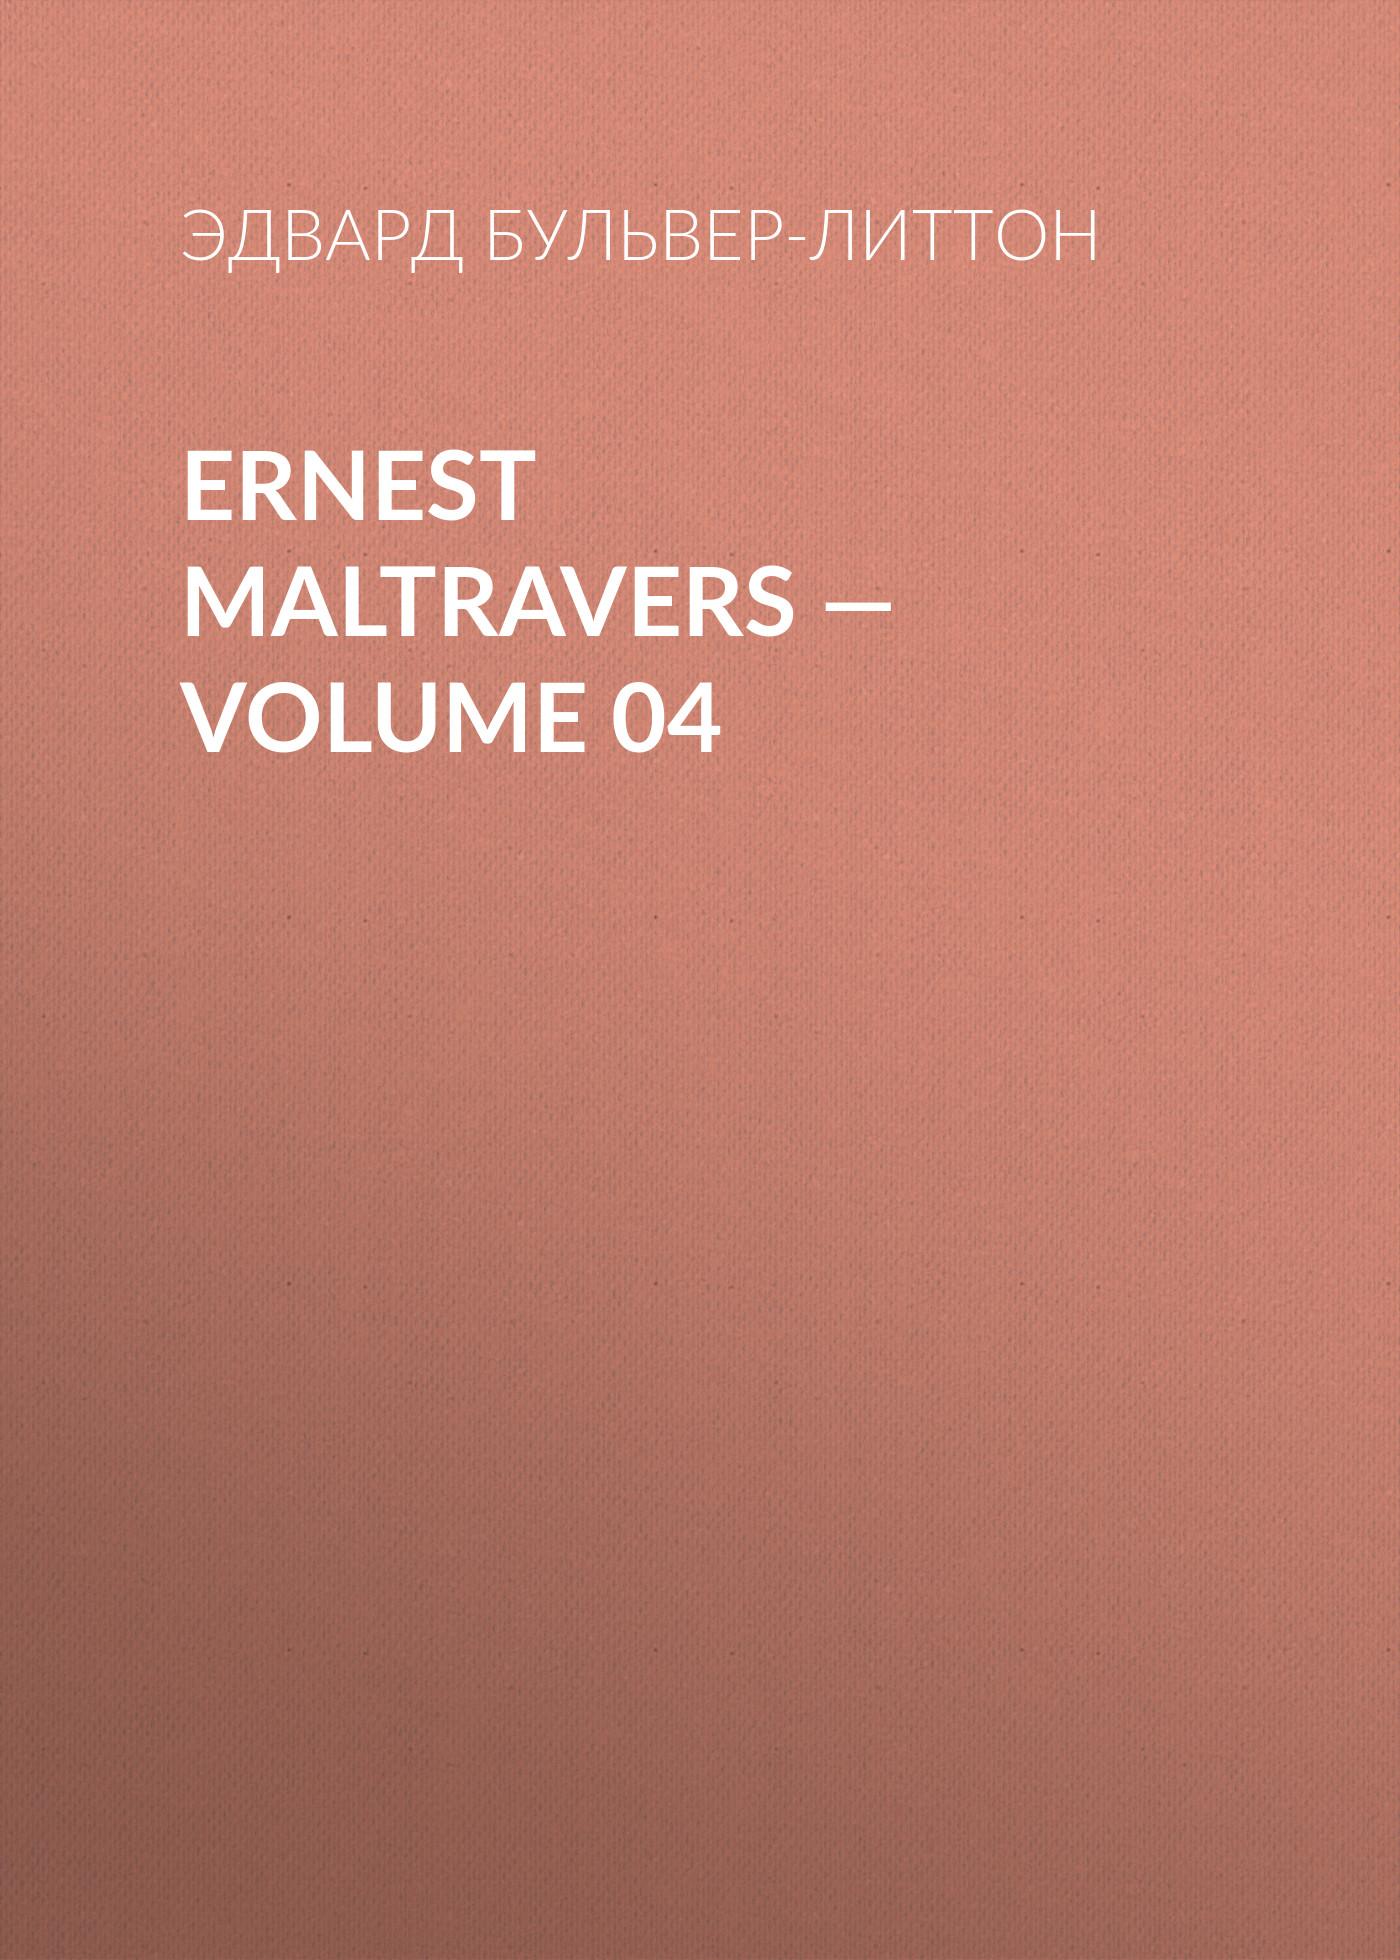 Ernest Maltravers — Volume 04